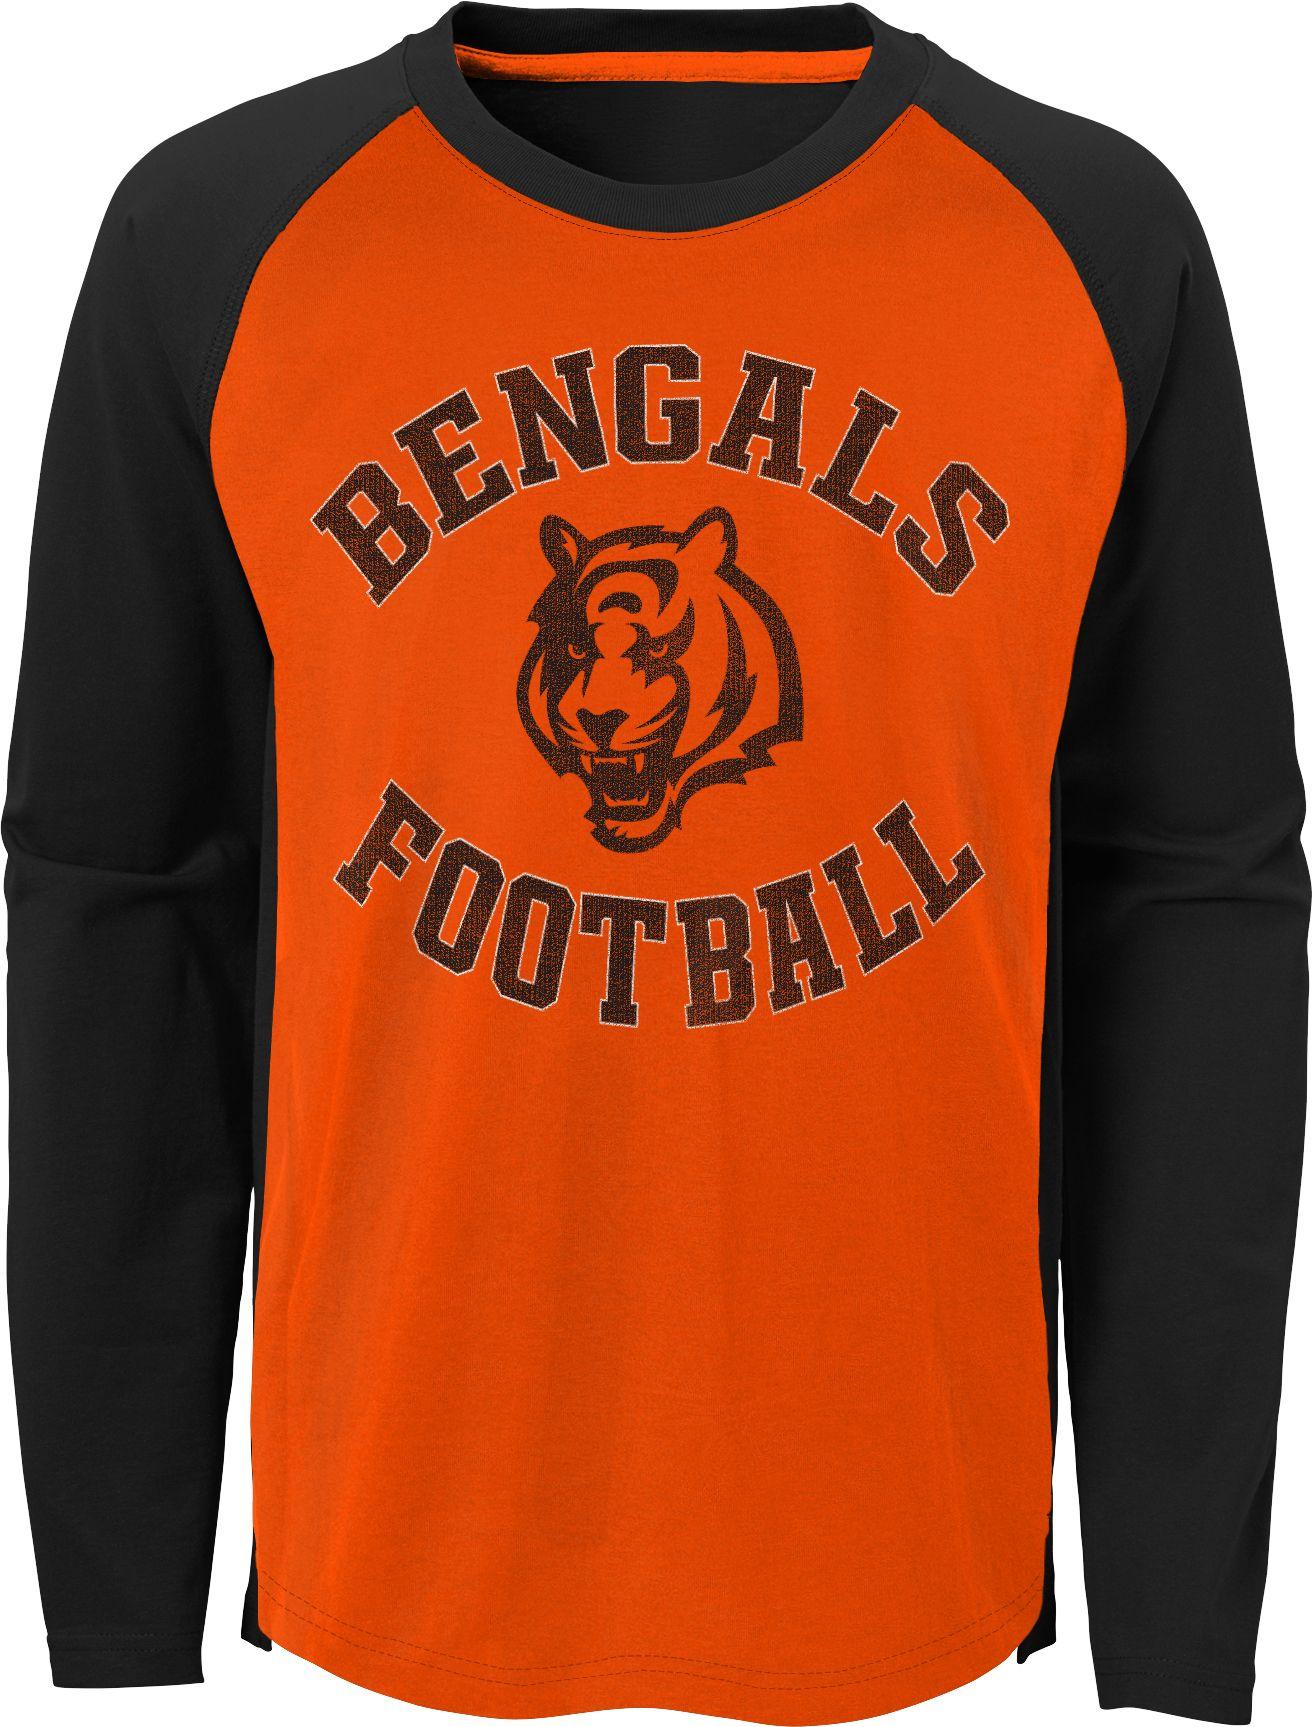 bengals long sleeve shirts